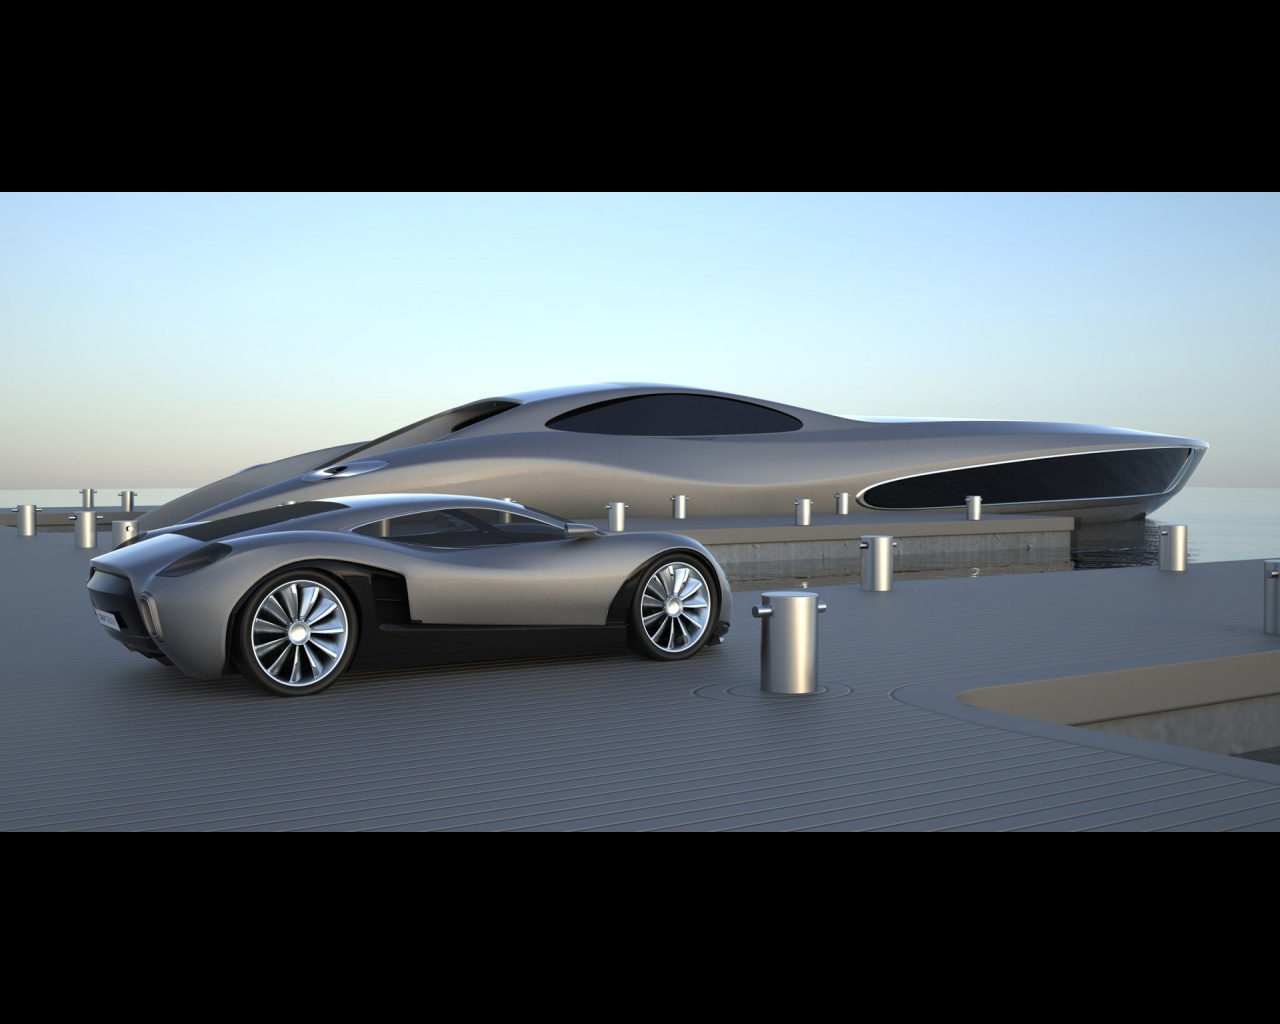 Supercars Wallpapers HD - WallpaperSafari Bugatti Renaissance Concept